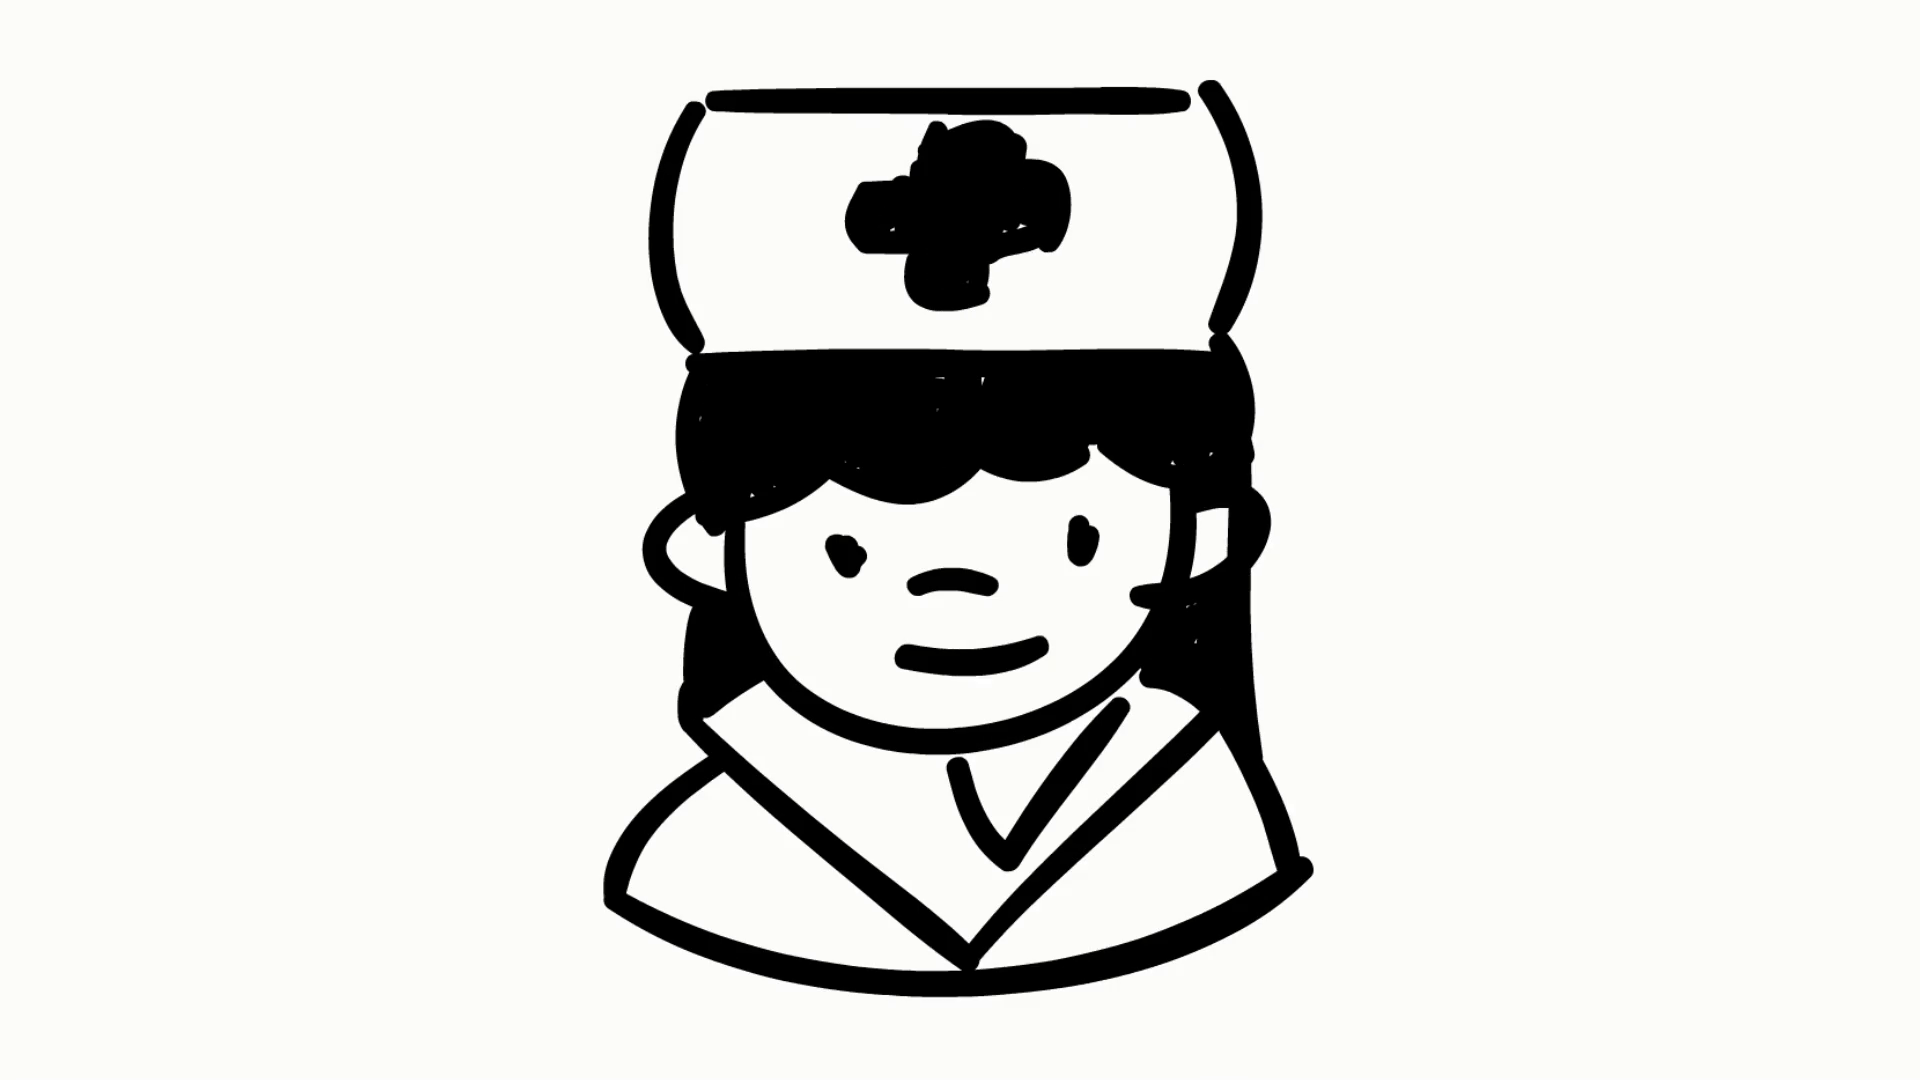 1920x1080 Nurse Medical Hospital Sketch Illustration Hand Drawn Animation